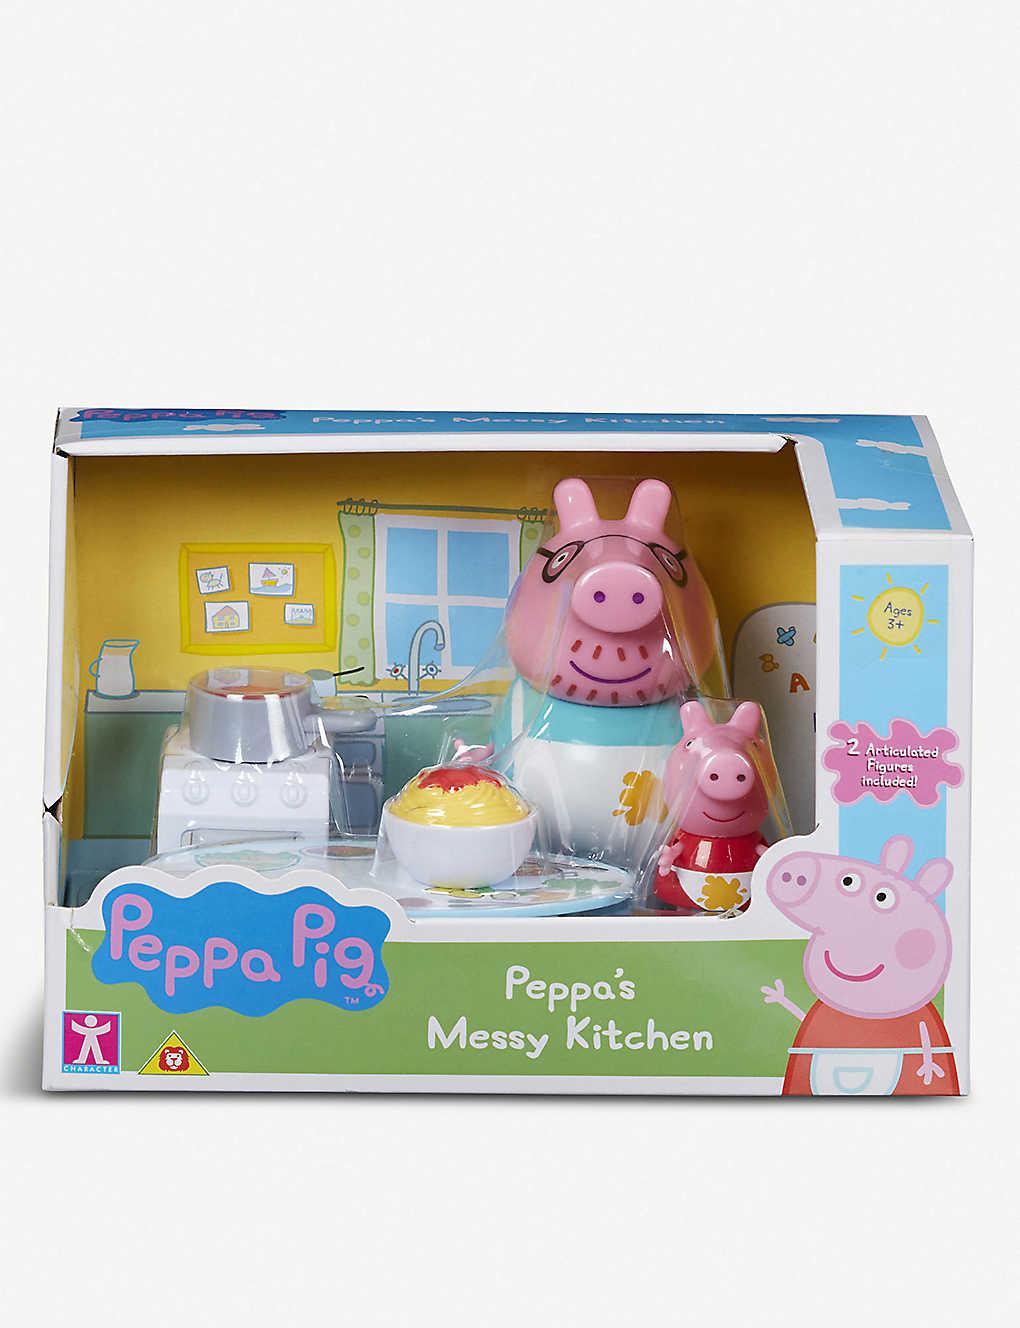 Peppa Pig Messy Kitchen Or Shopping Trip Blind Bag